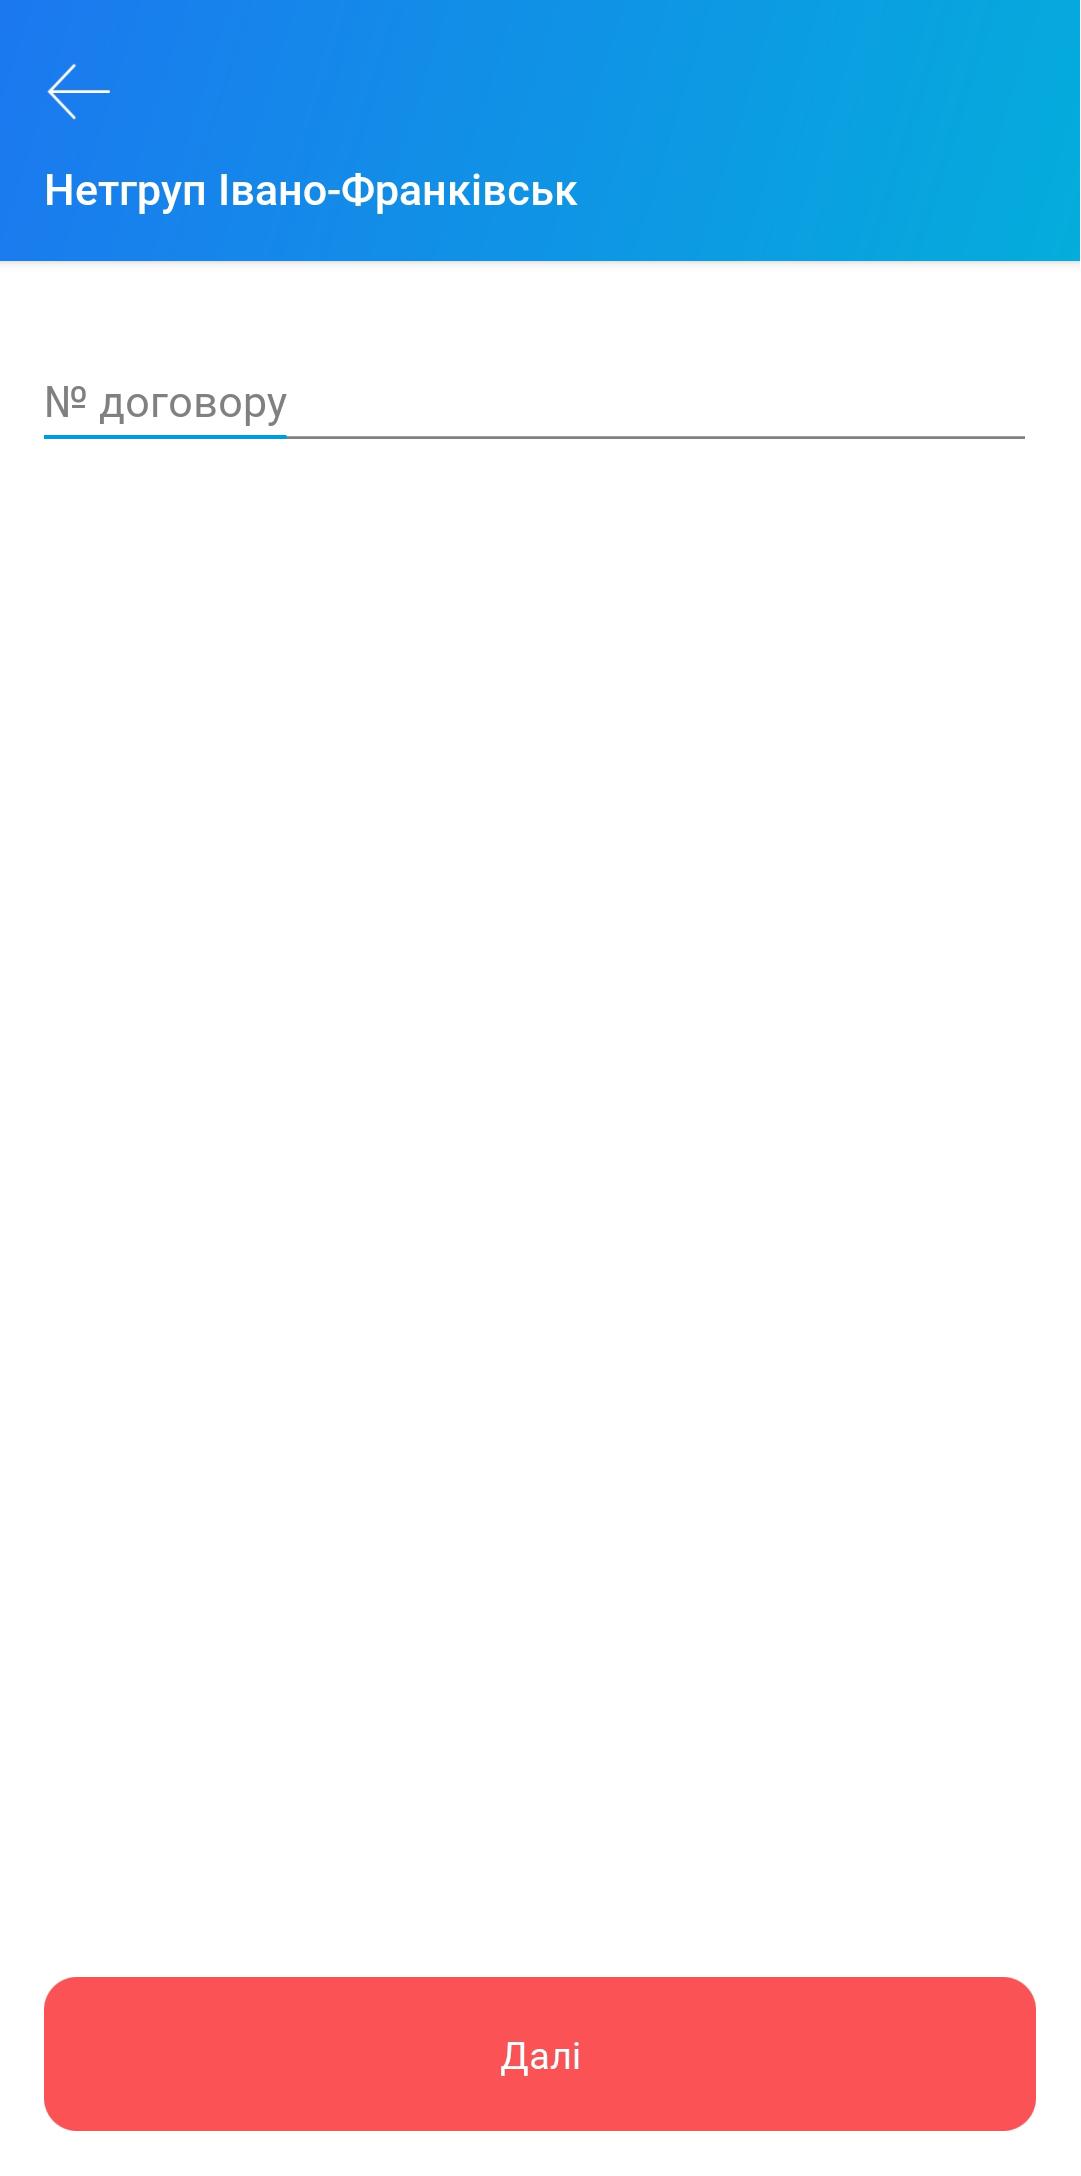 монобанк івано-франківськ | netgroup